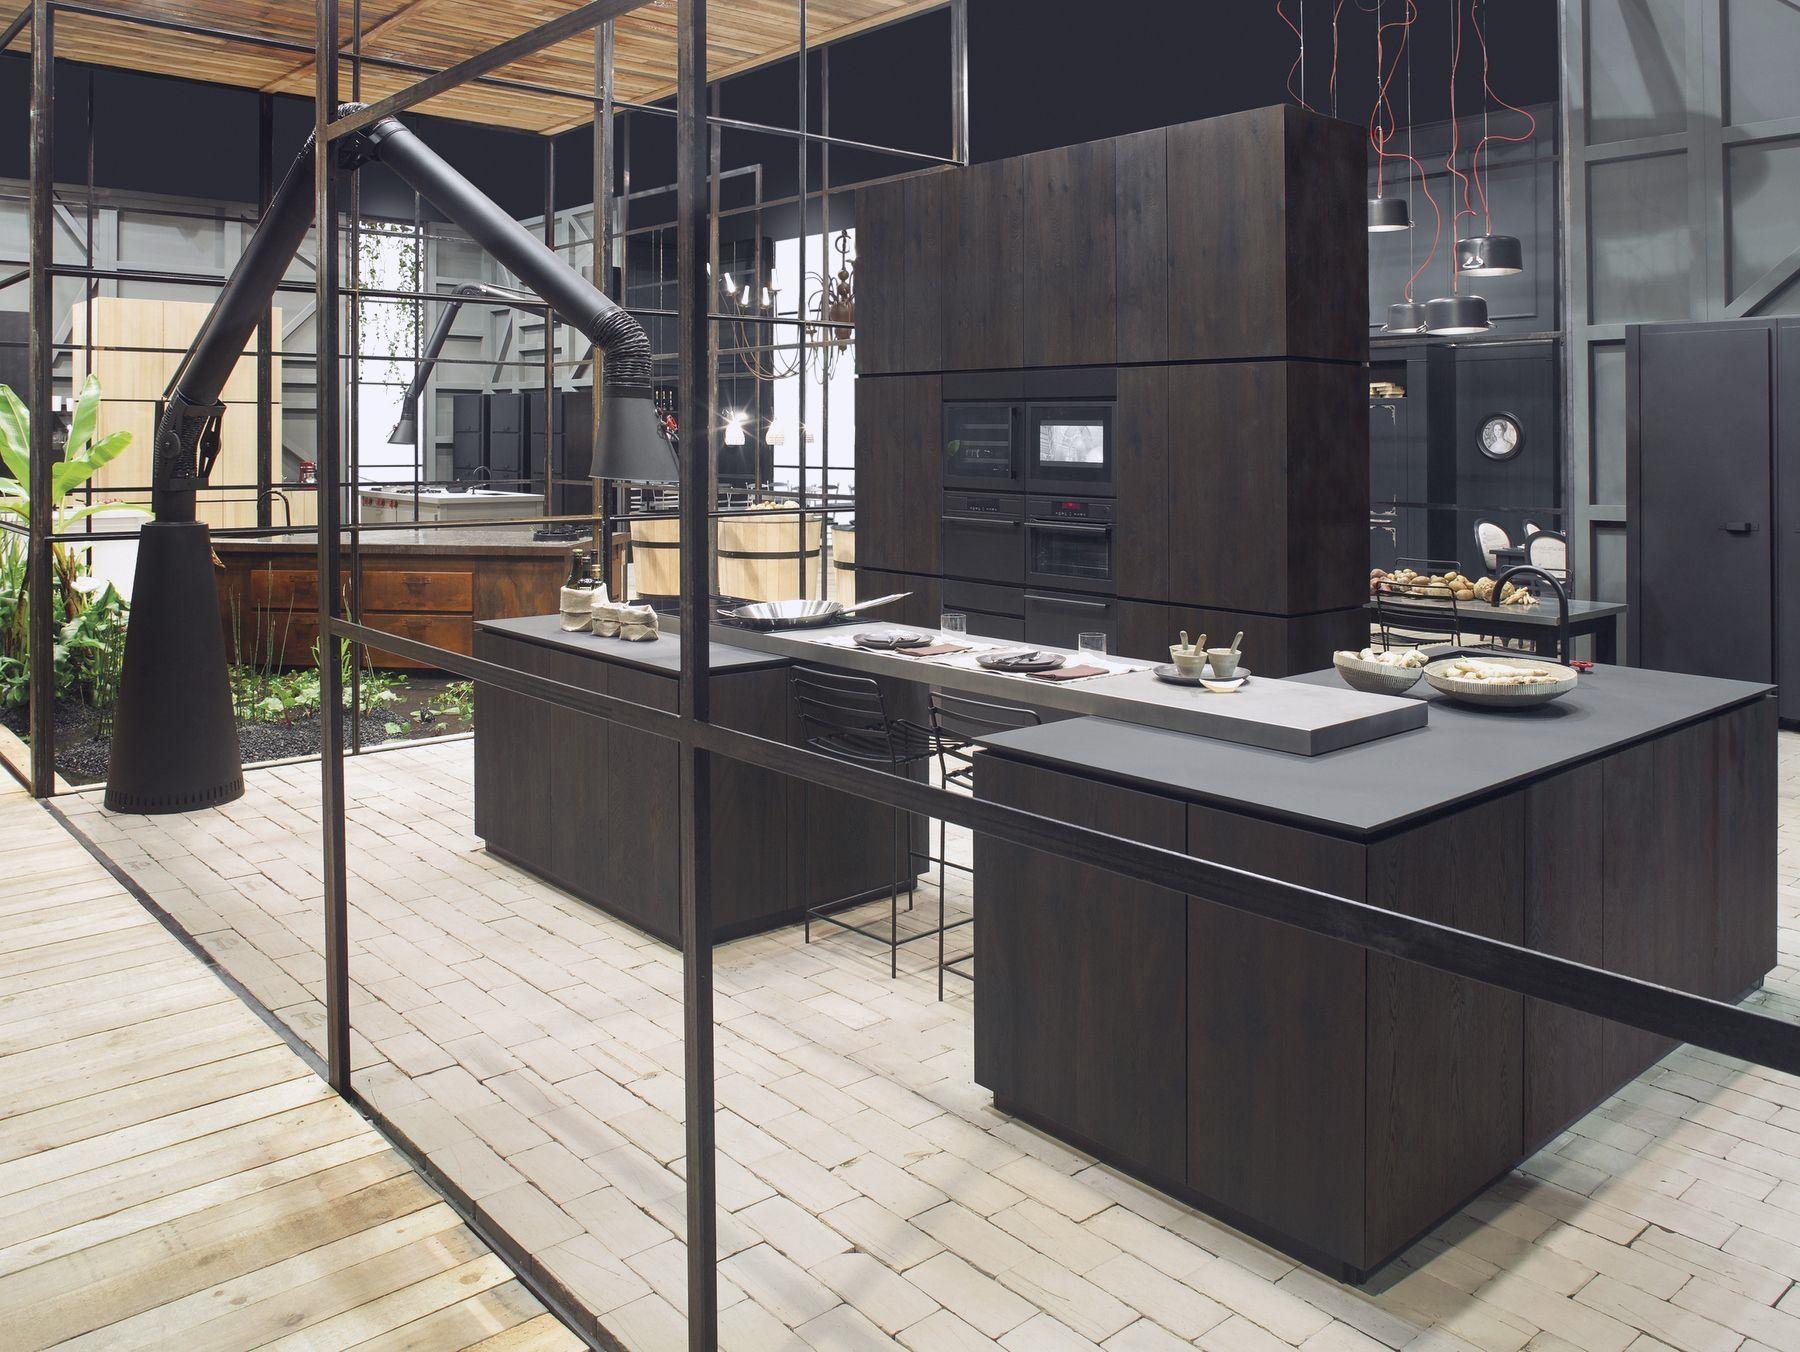 Cucina in fibra di legno con isola natural skin home for Cucine moderne scure